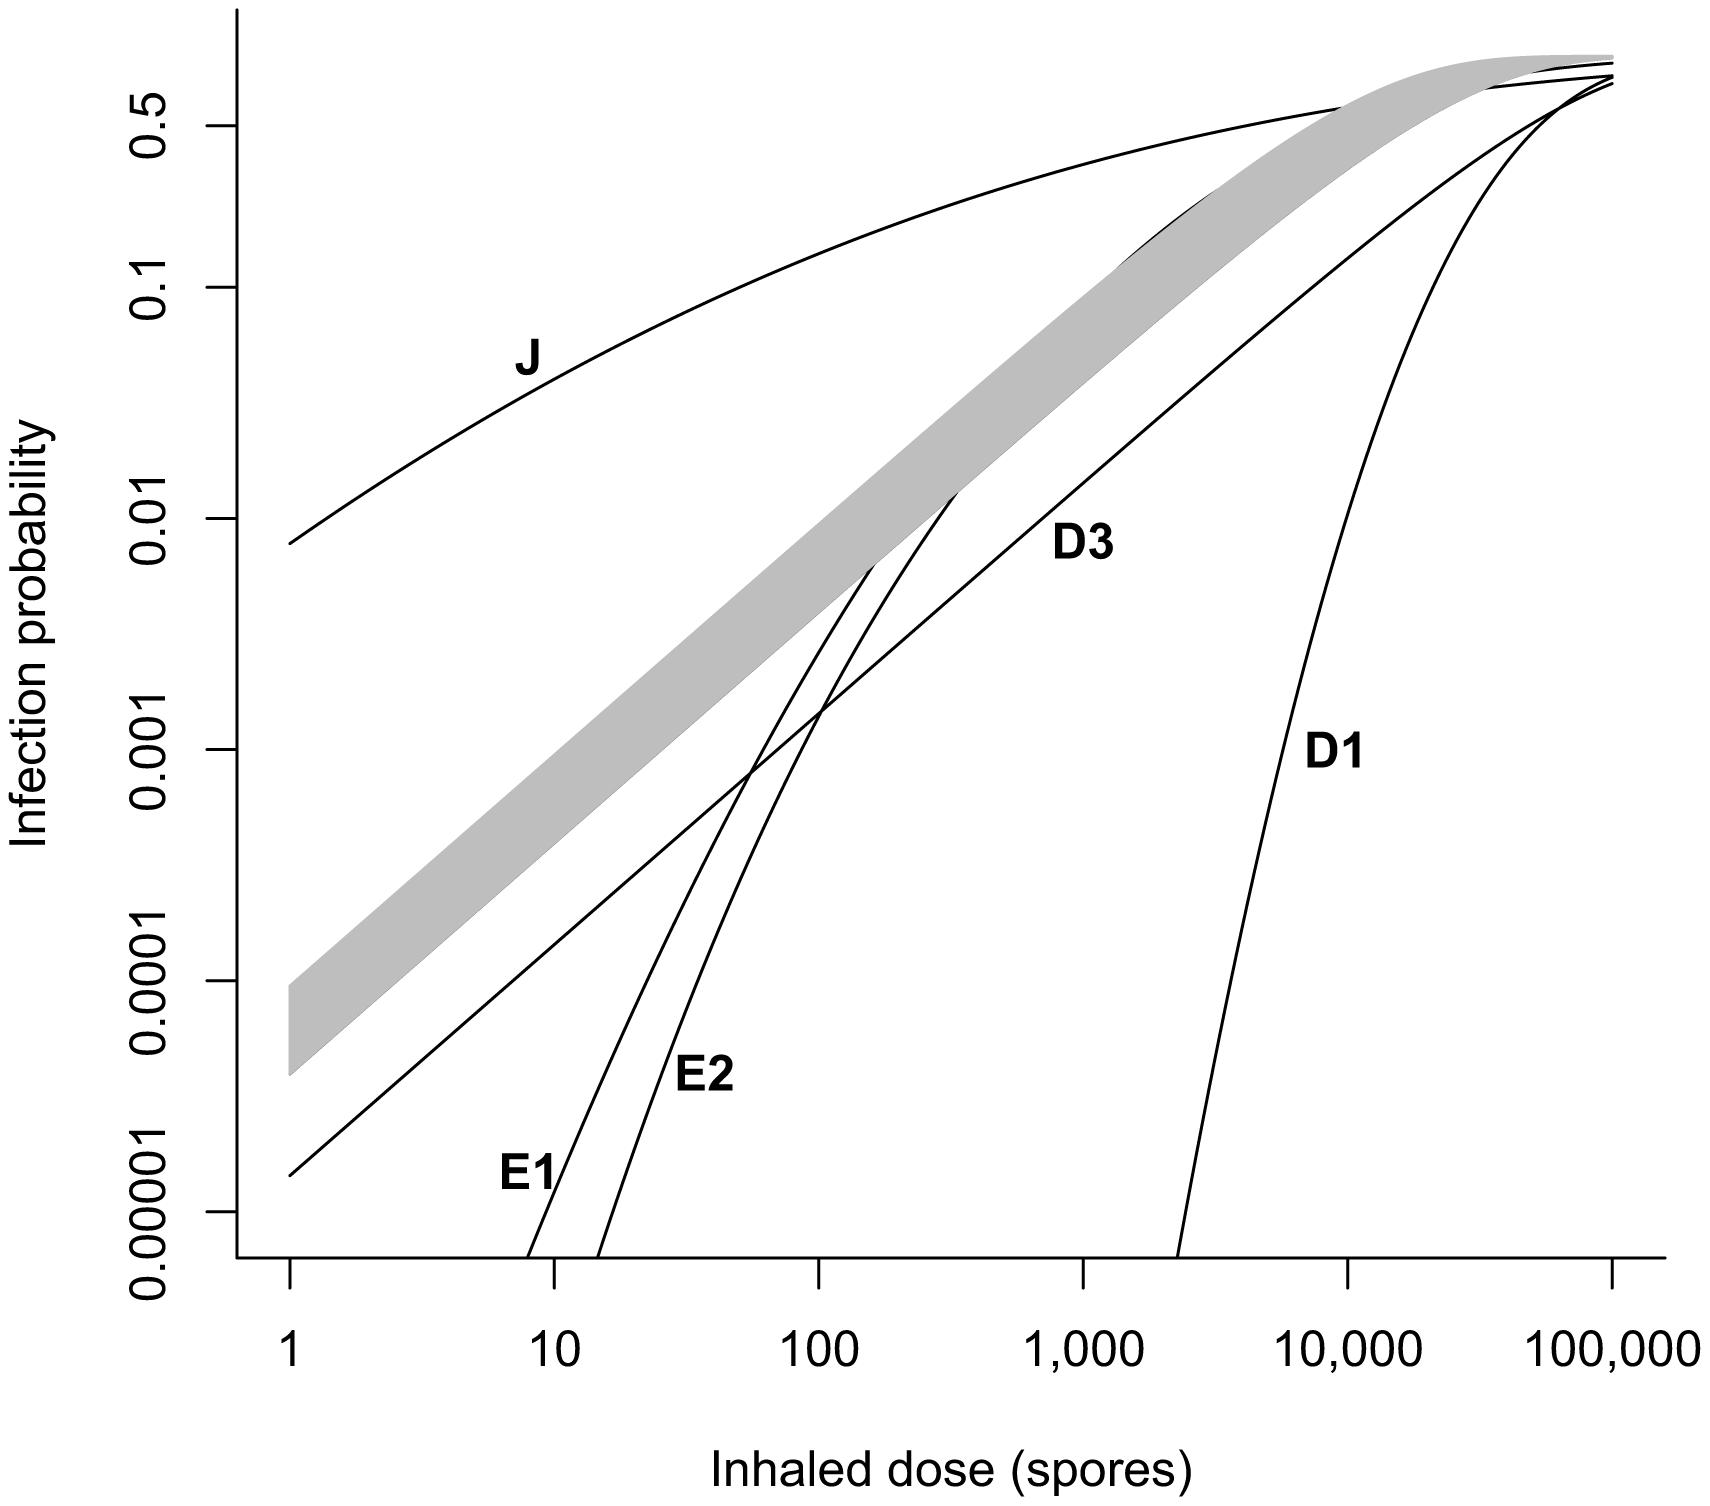 Comparison of dose-response models.